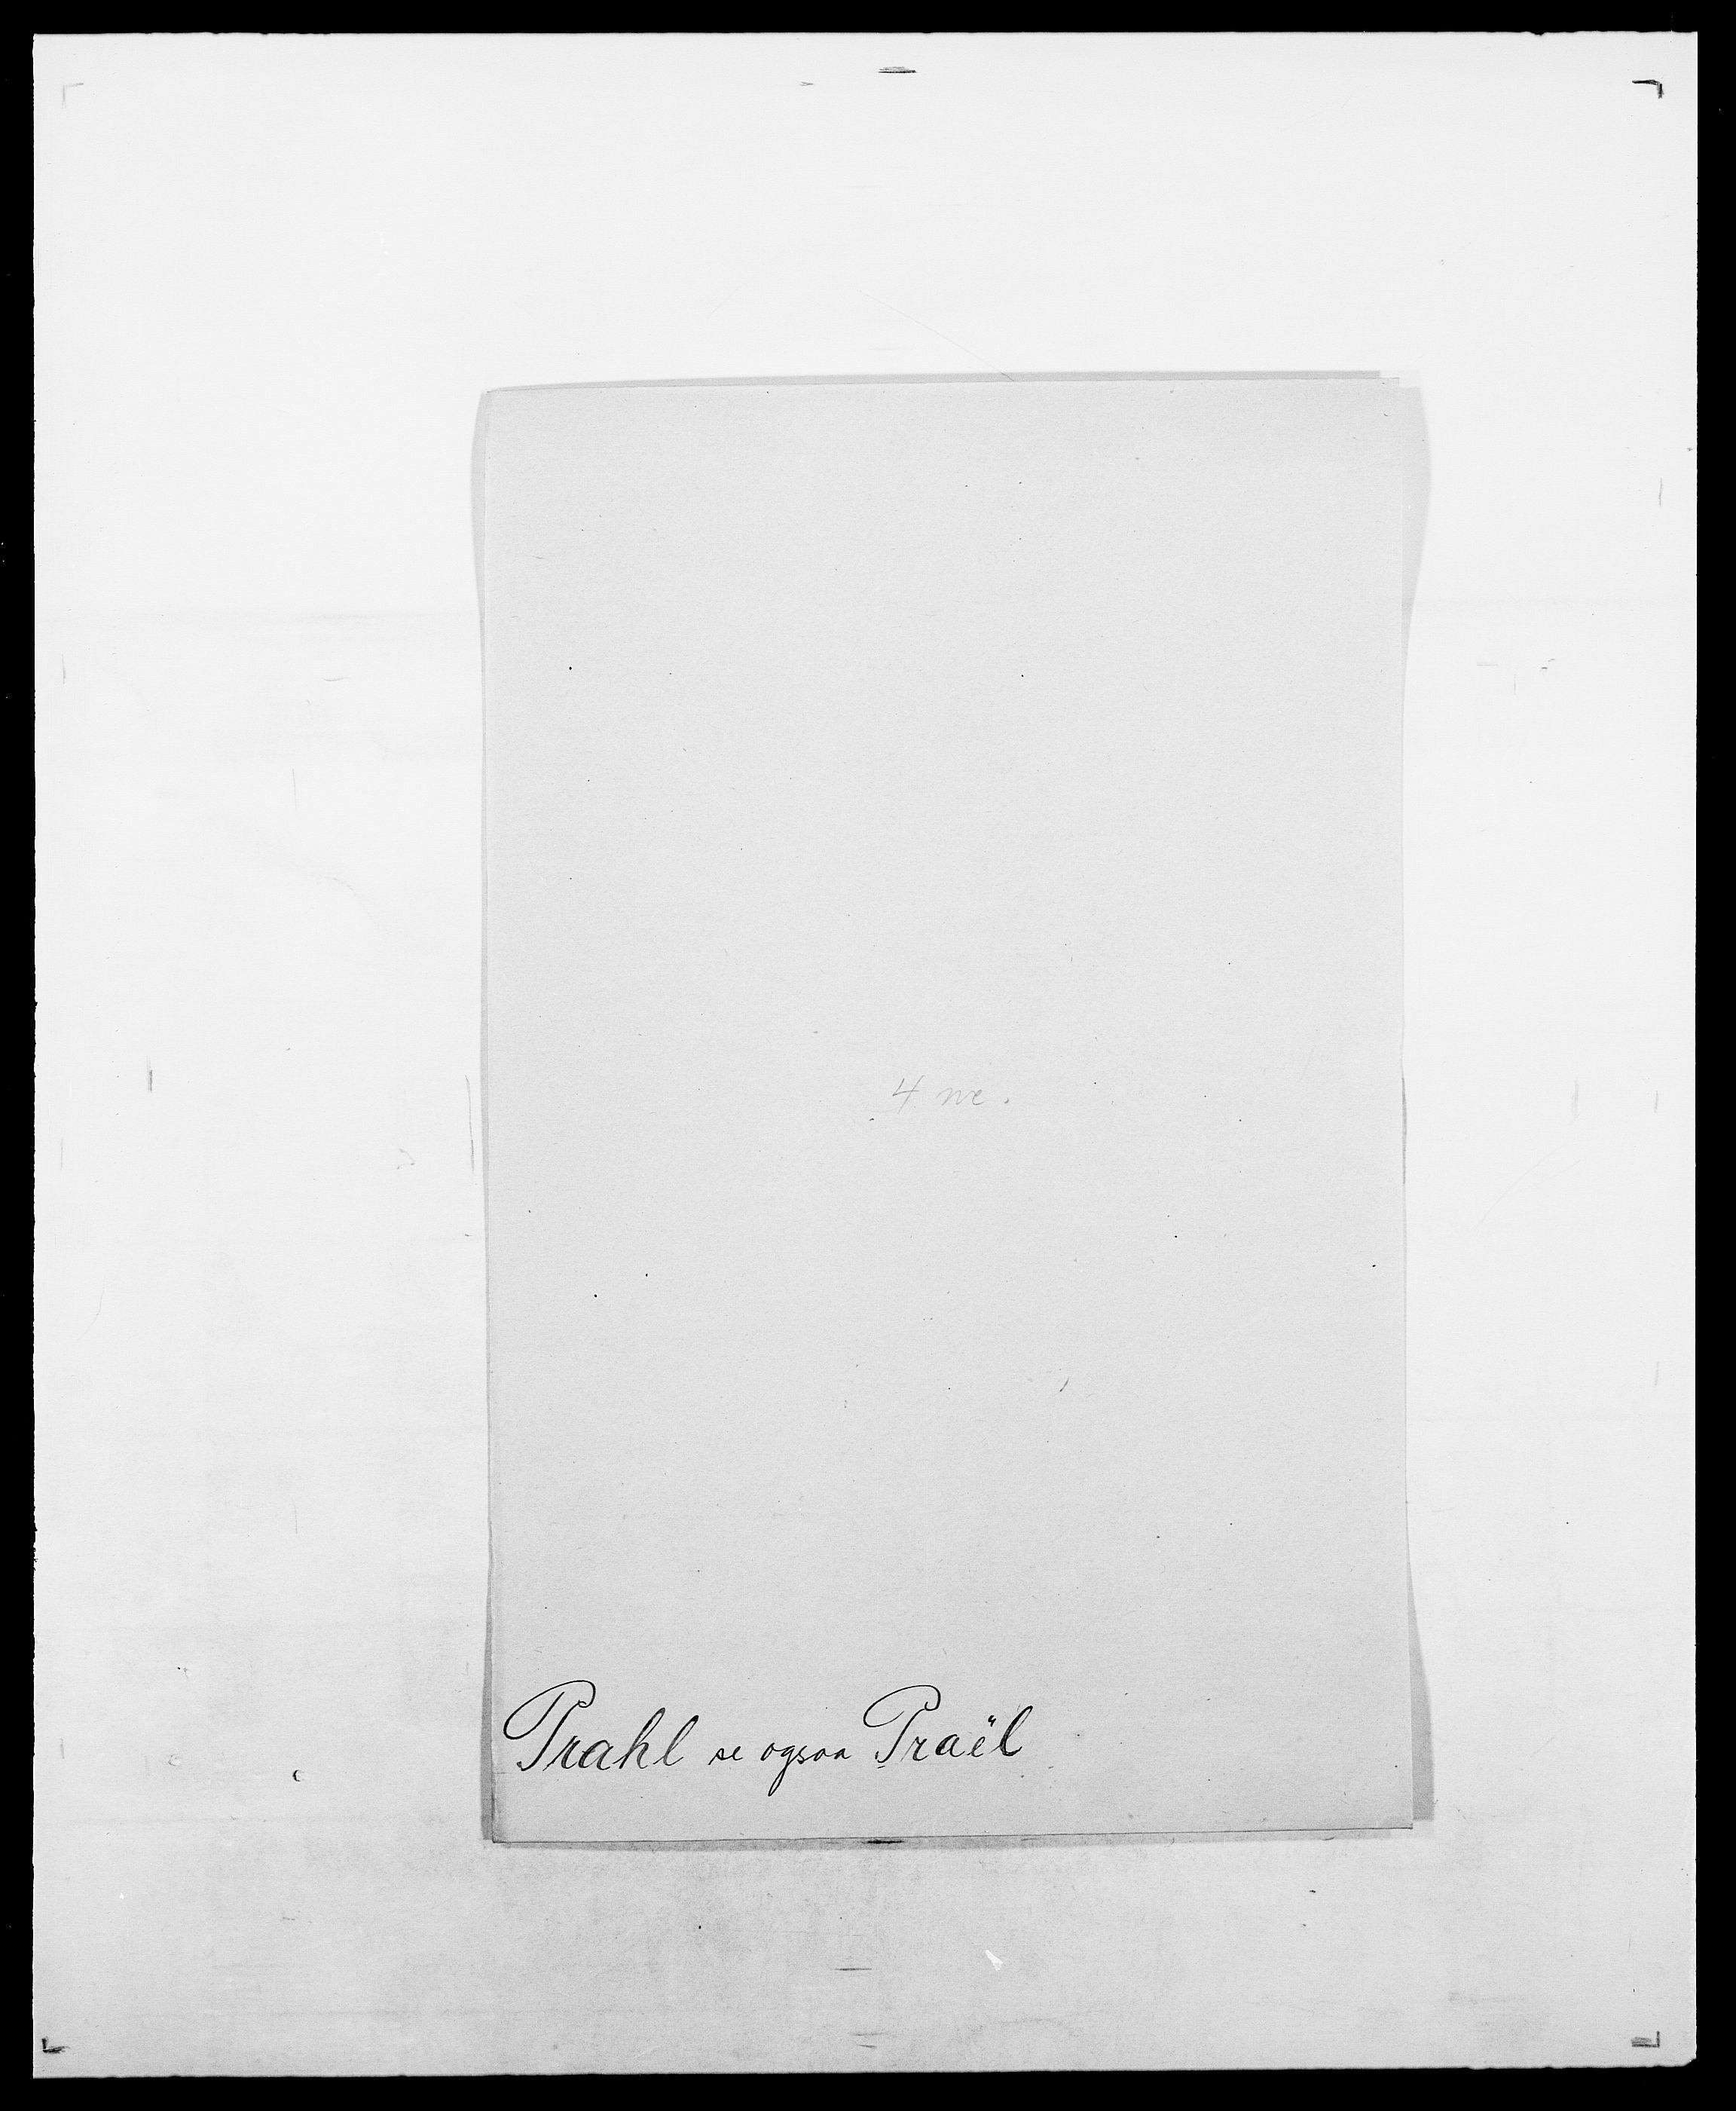 SAO, Delgobe, Charles Antoine - samling, D/Da/L0031: de Place - Raaum, s. 280